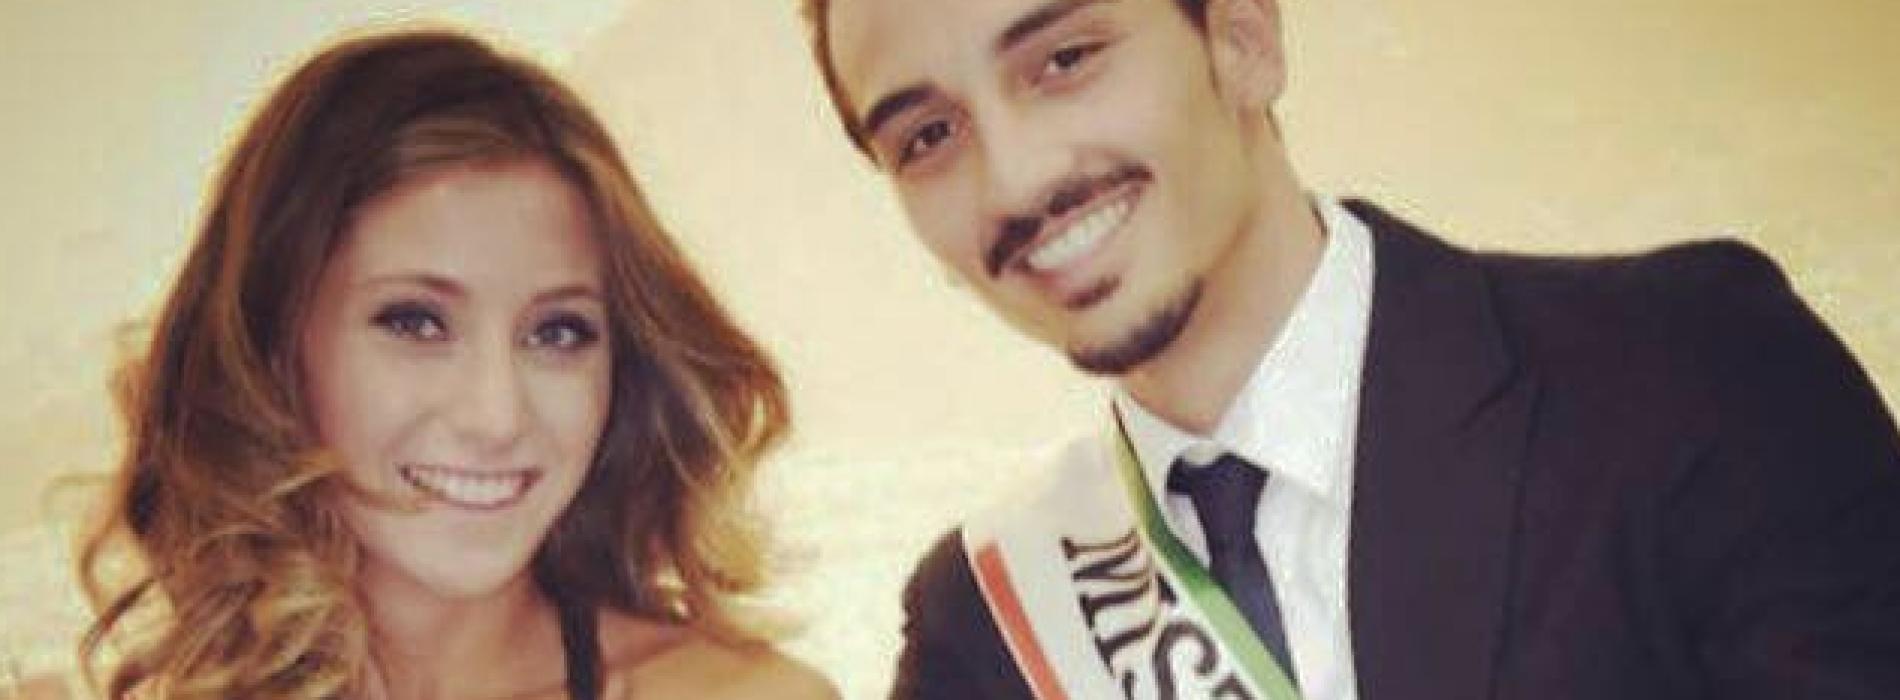 Alla casertana Carola d'Ambra la fascia Miss Campania